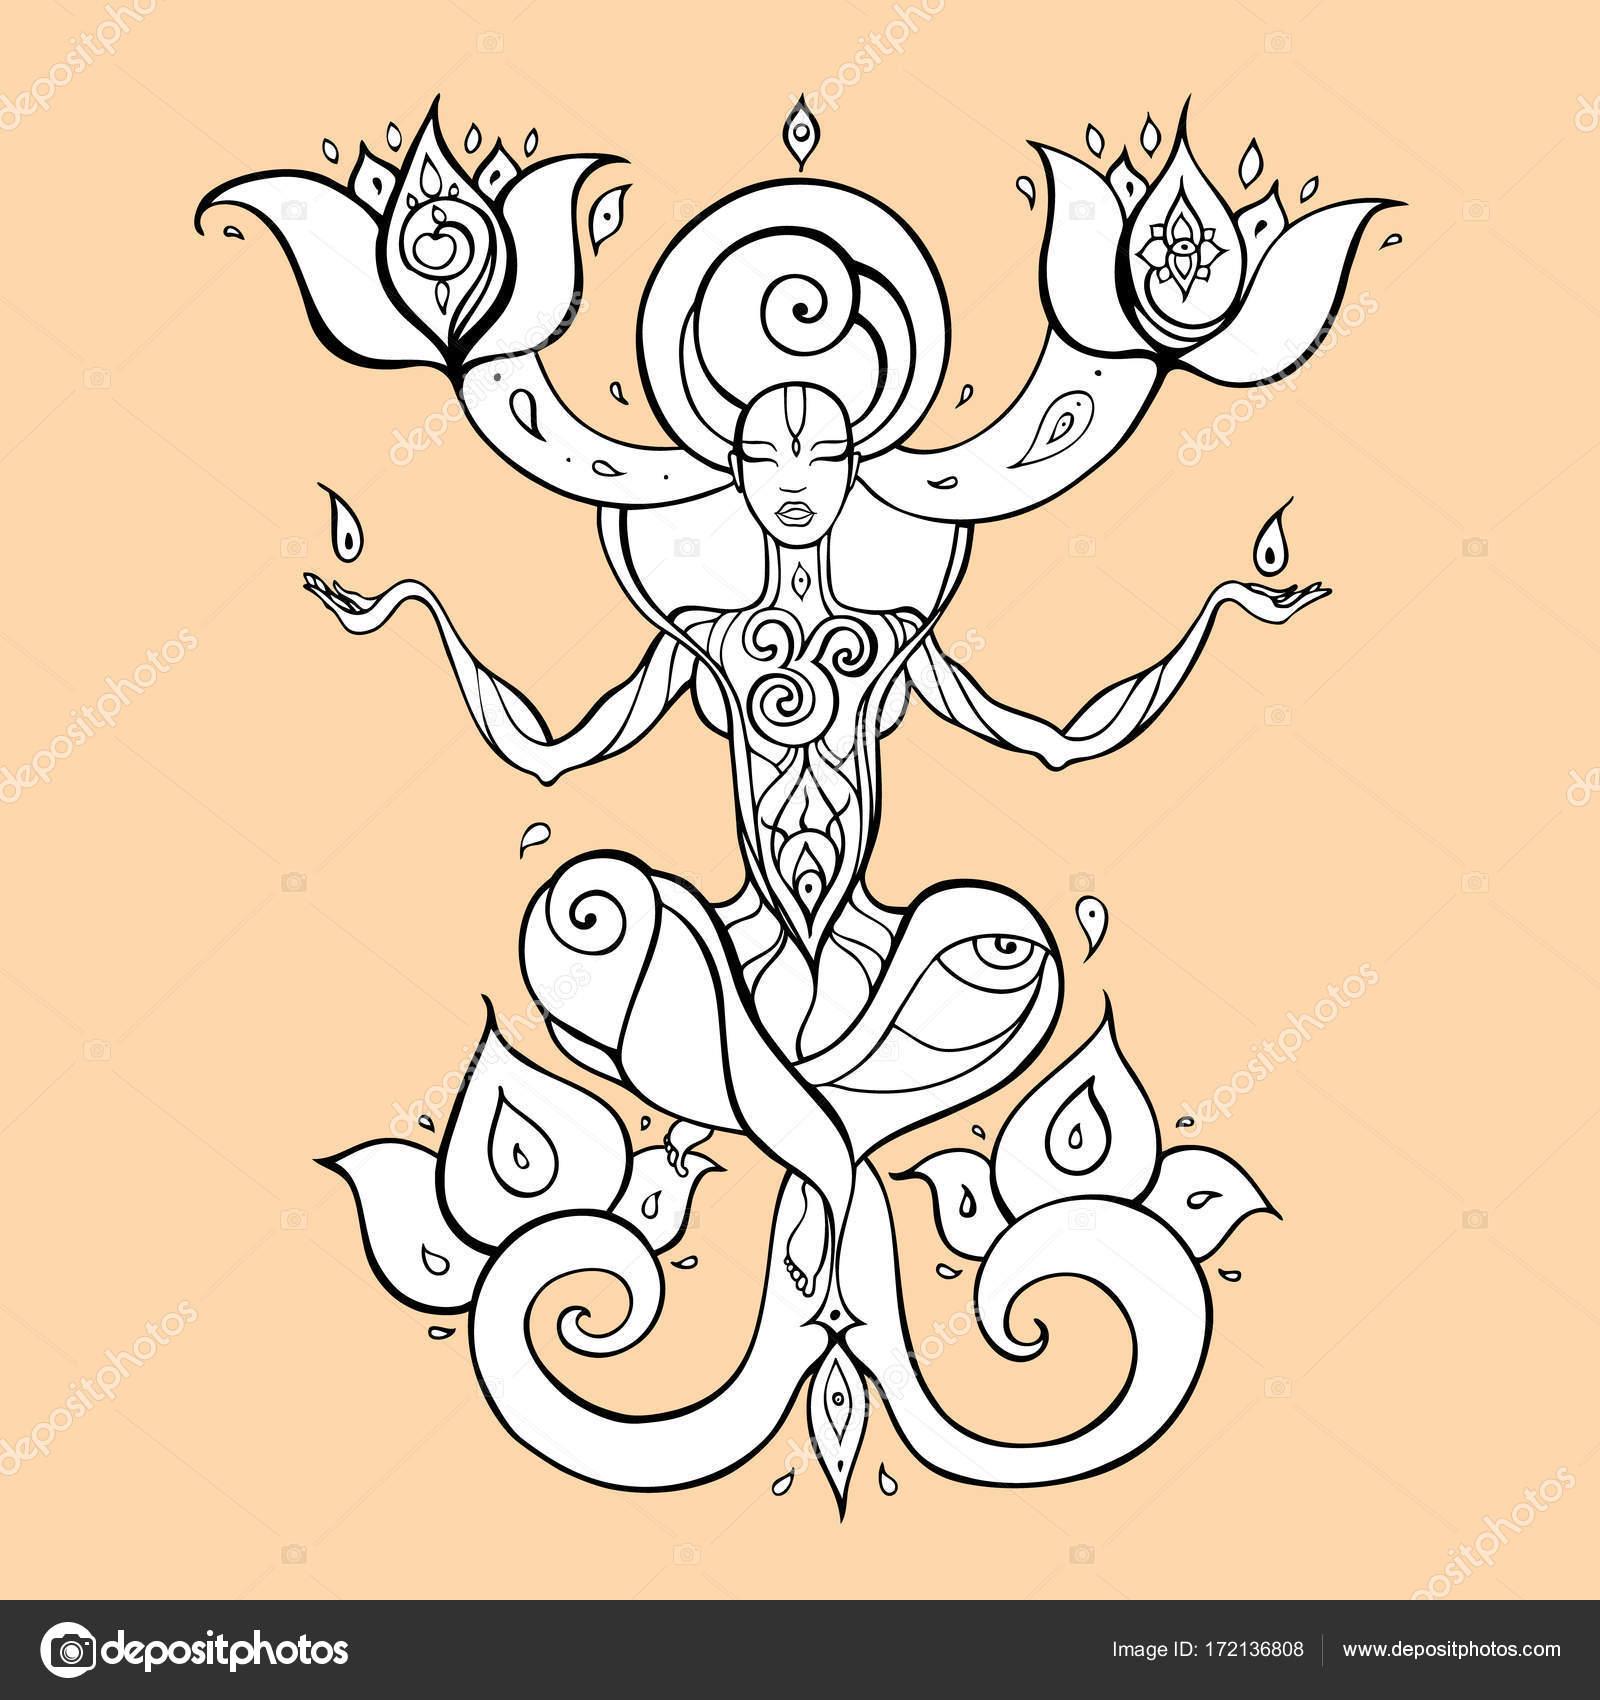 Meditation Yoga Silhouette Stock Vector C Katyaulitina 172136808